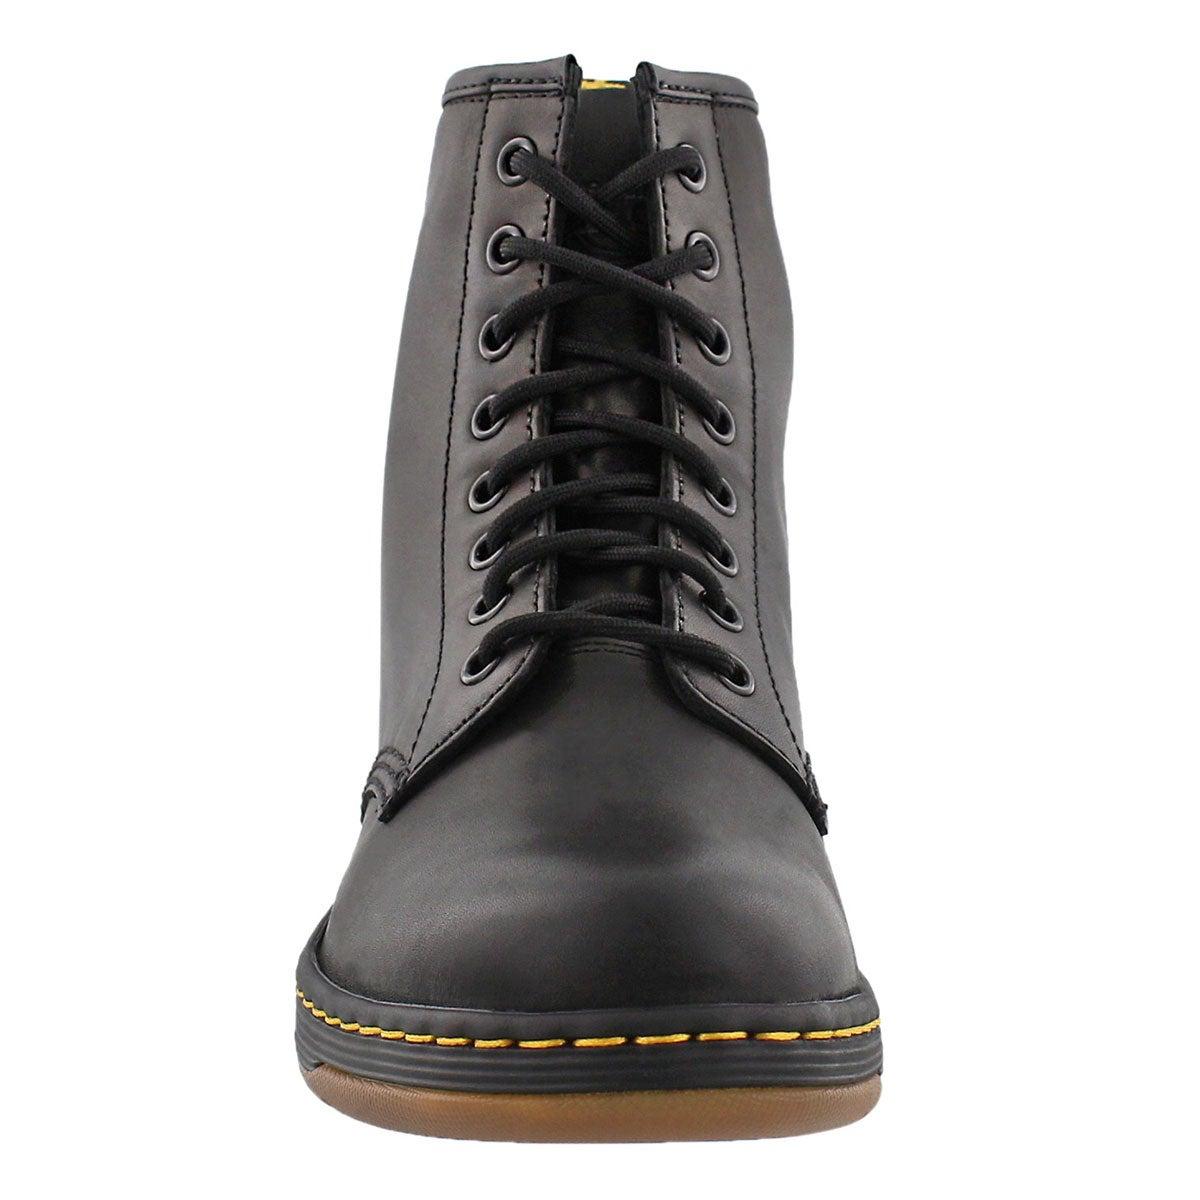 Lds Lite Newton black 8 eye combat boot